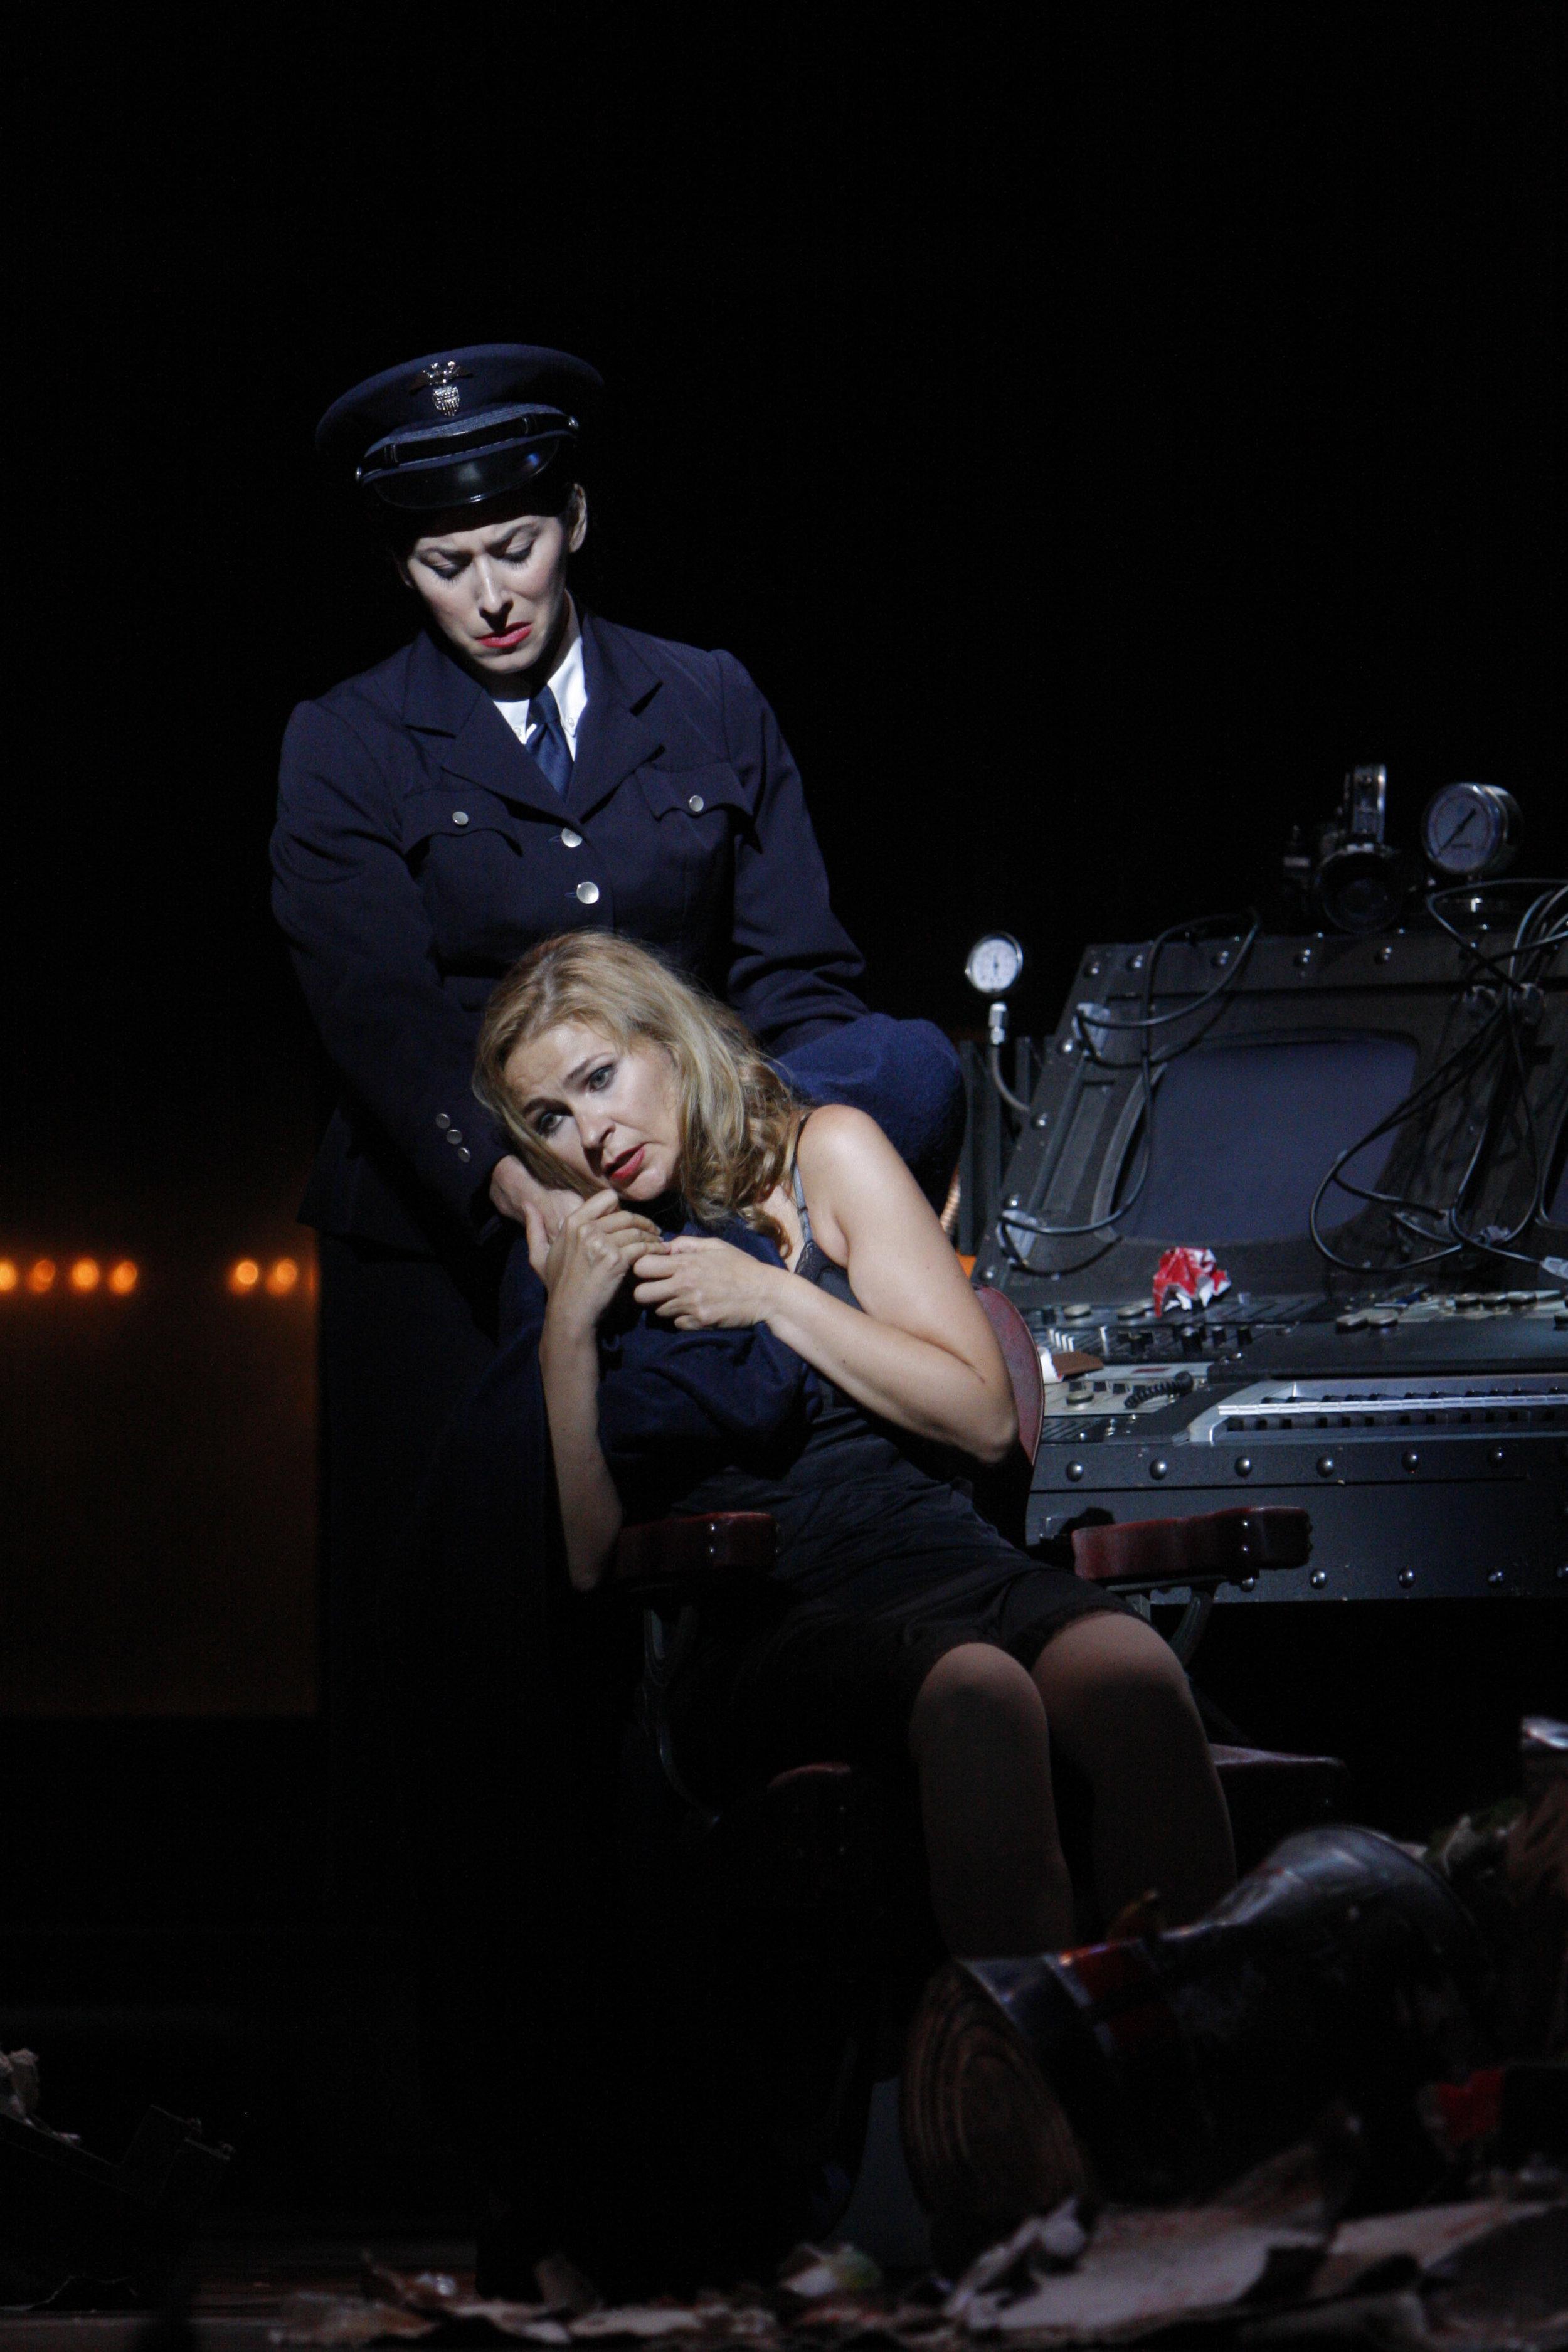 Beth Clayton (top) as the Officer, with Ruxandra Donose as Veronica Quaife in The Fly. 图片来源: Robert Millard, 美国洛杉矶歌剧院, 2008